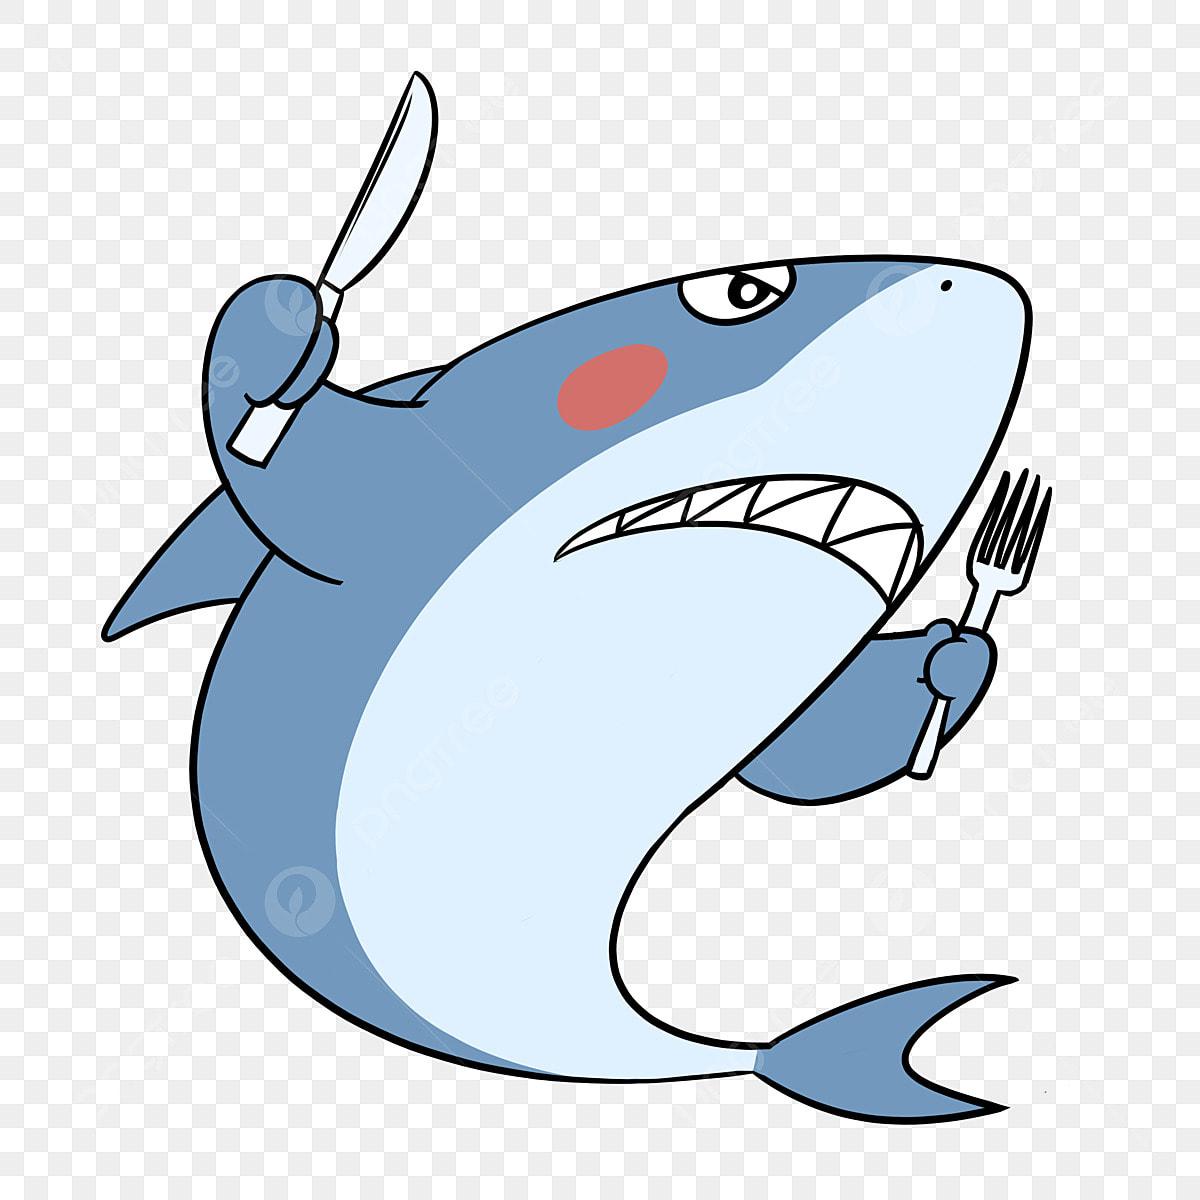 Cartoon Cute Shark Png Transparent Bottom Shark Clipart Cartoon Shark Png Transparent Clipart Image And Psd File For Free Download Blue shark, bruce marlin shark, shark, marine mammal, animals png. https pngtree com freepng cartoon cute shark png transparent bottom 4552017 html